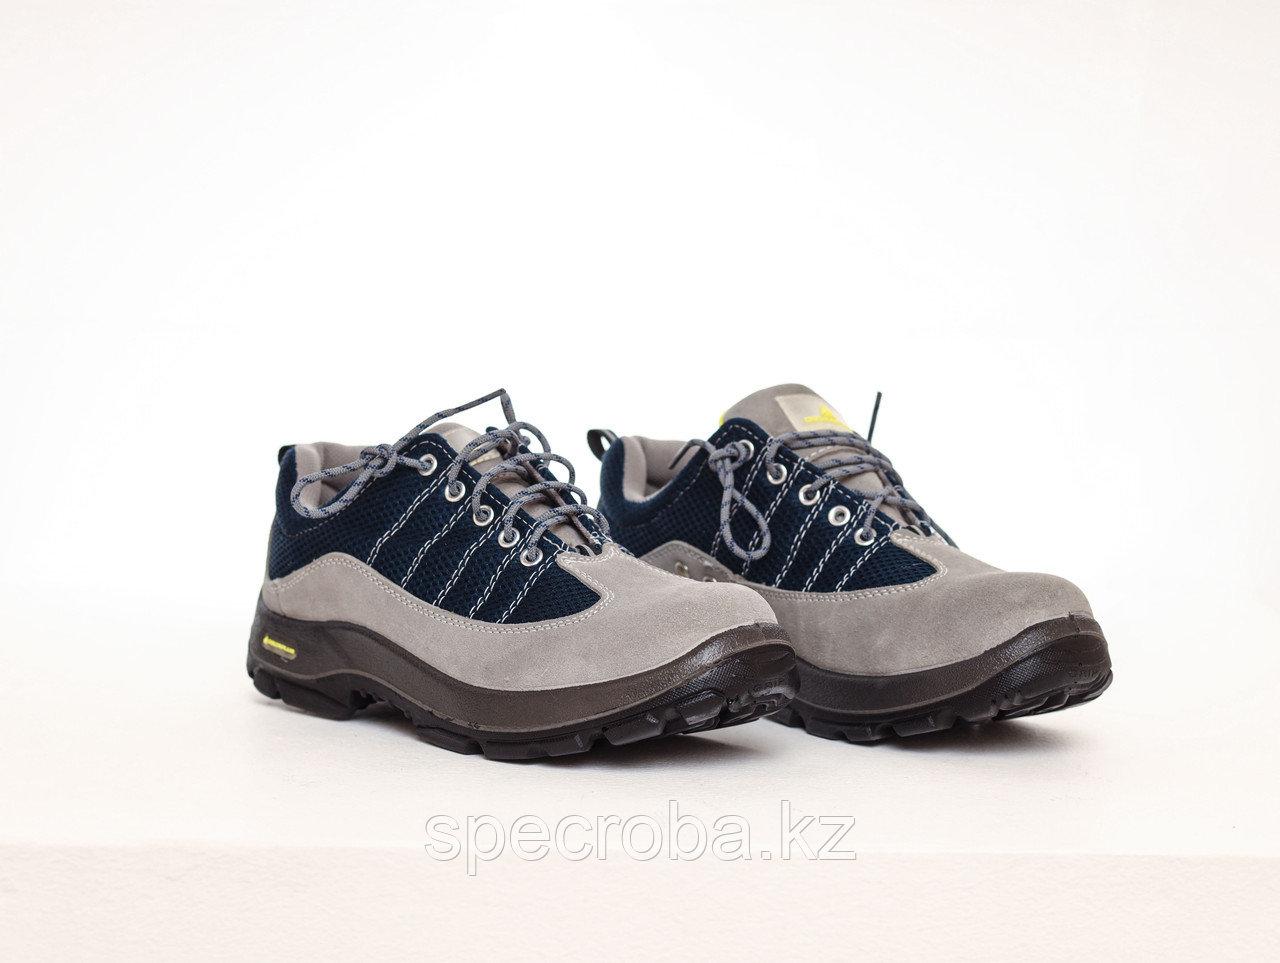 Туфли защитные PANOPLY RIMINI S1P SRC